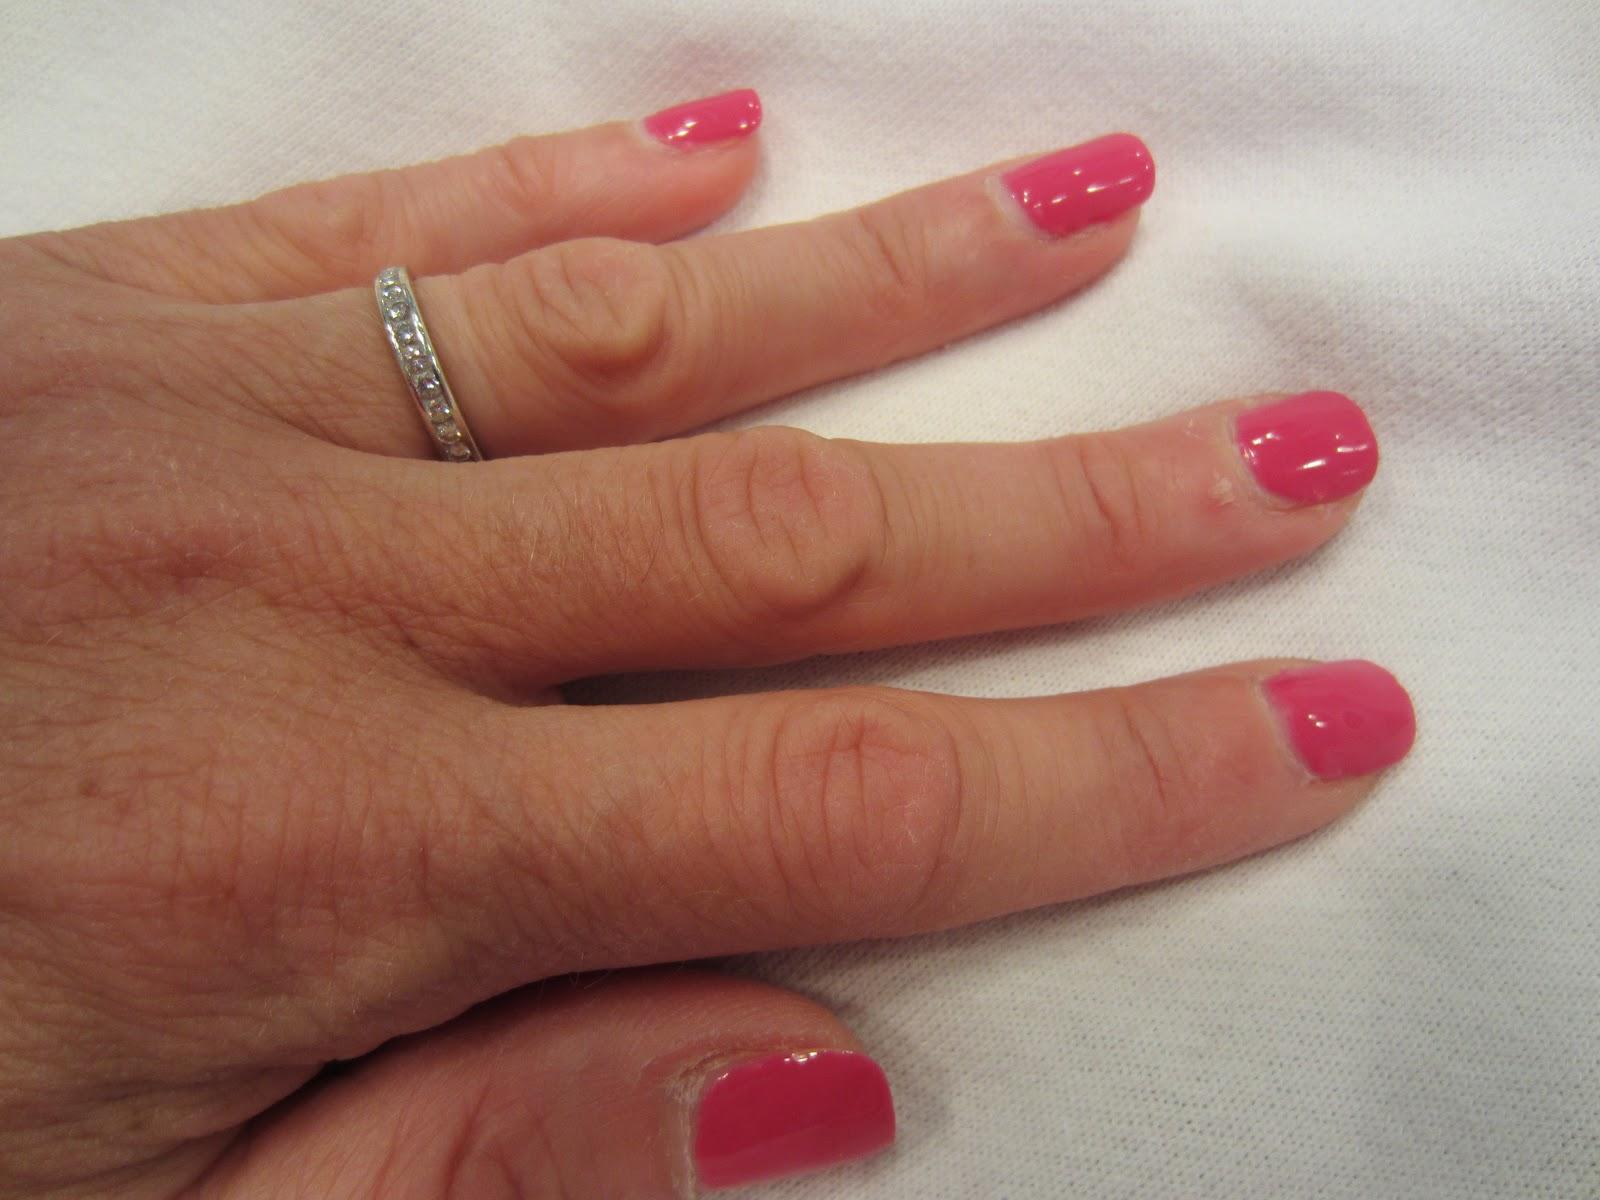 Gel Manicure after 9 days